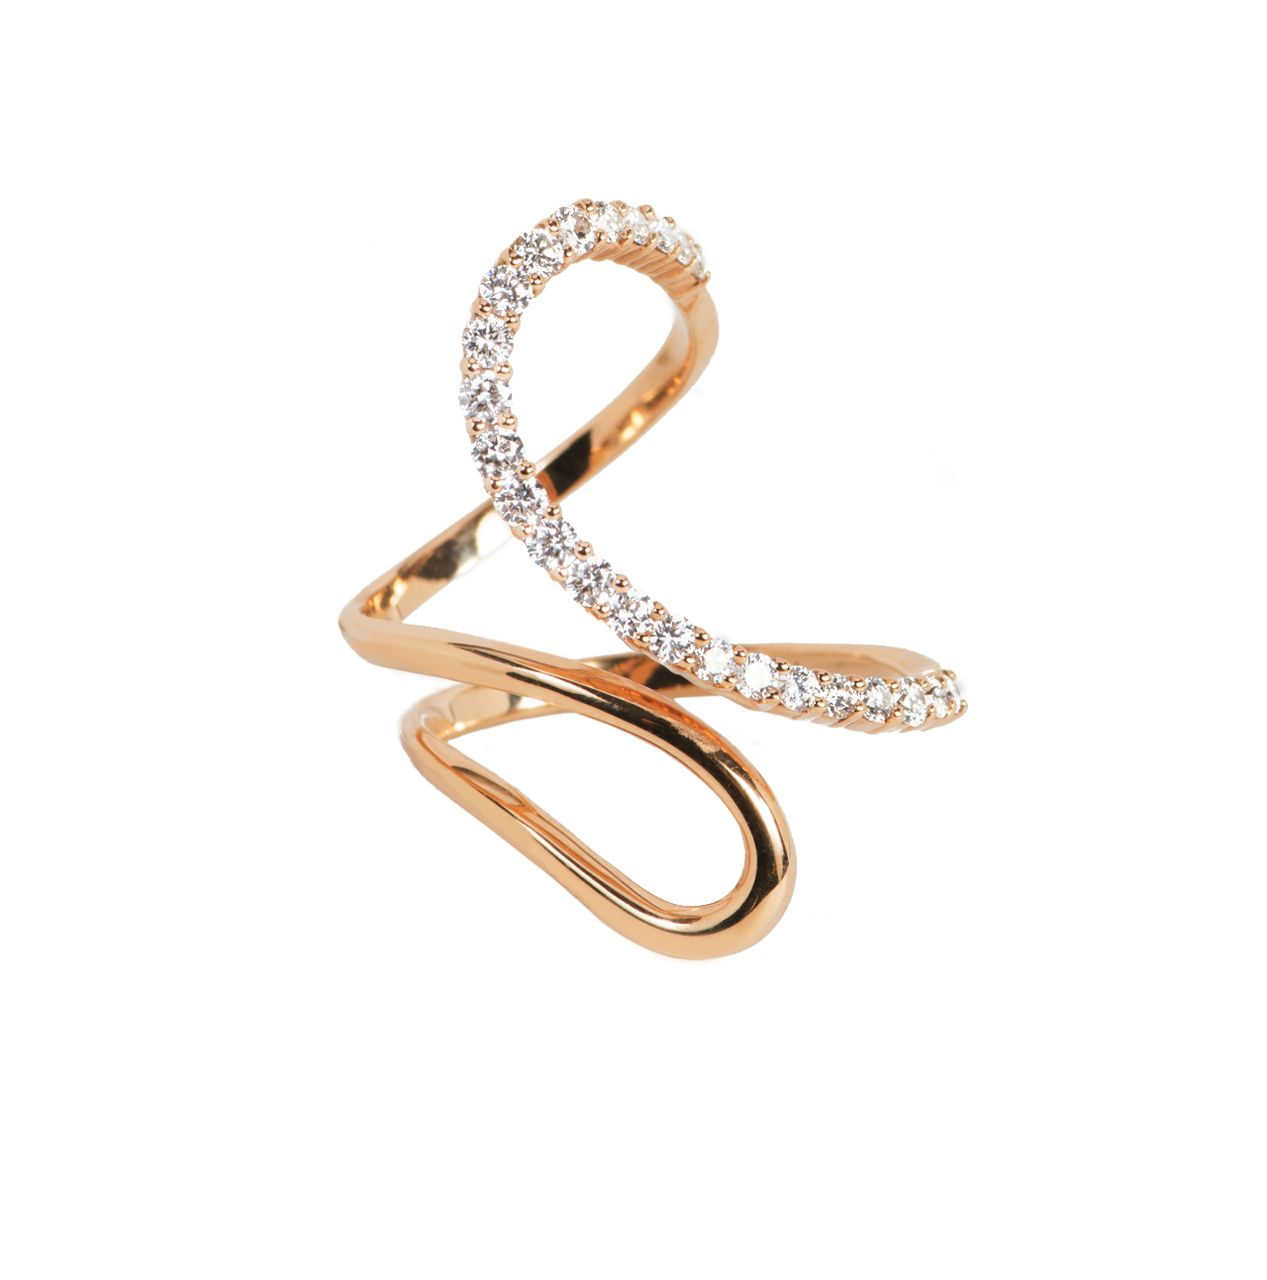 Rose gold high polish modern open swirl ring with diamonds diamond